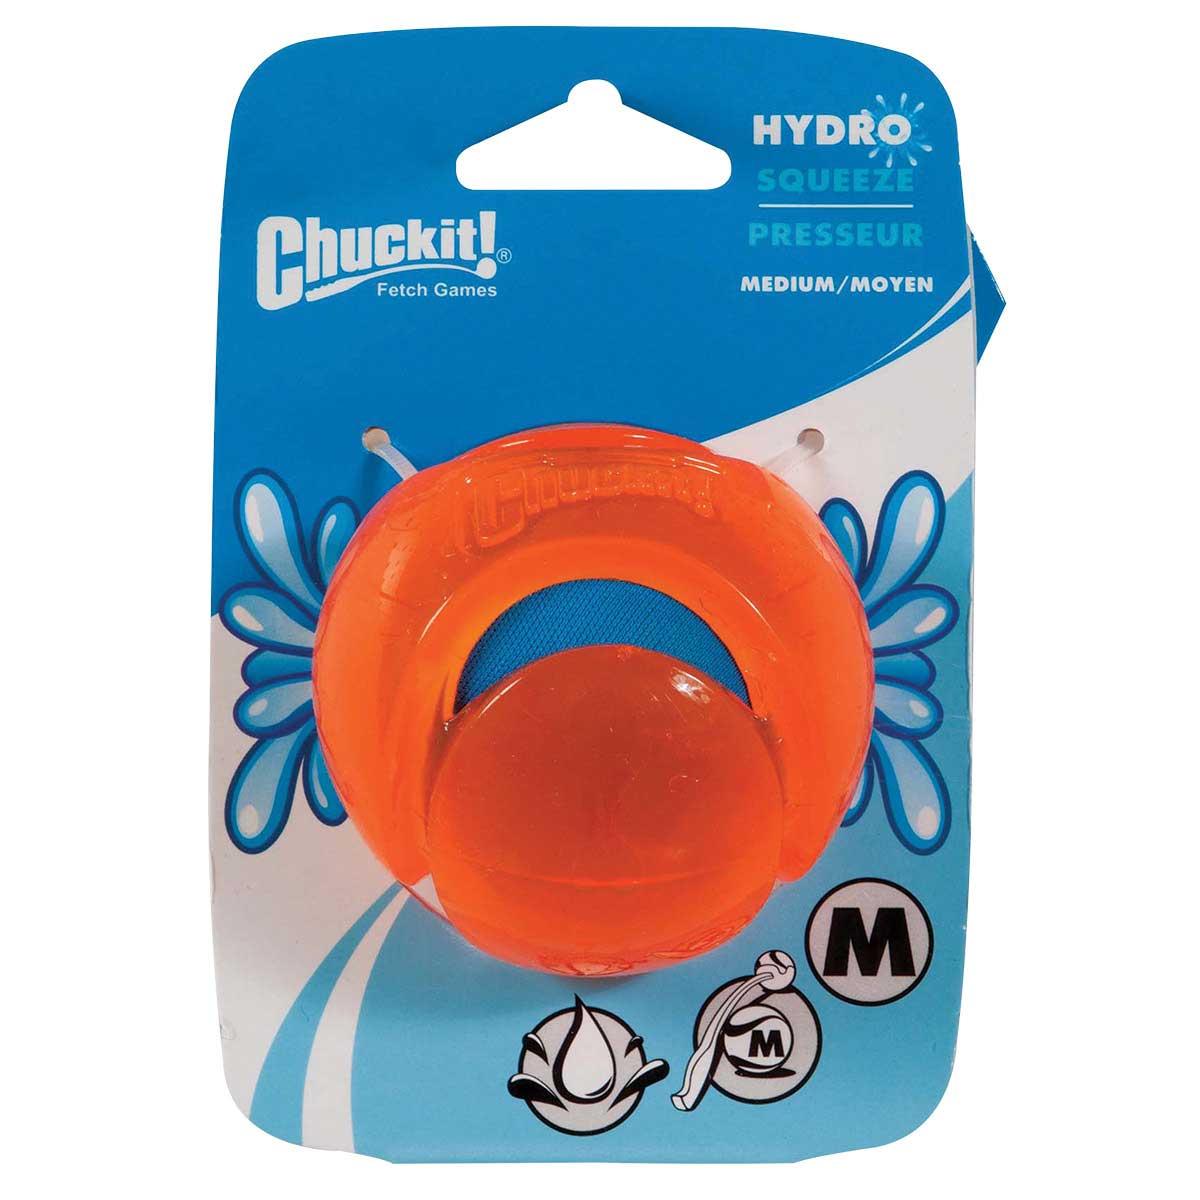 Chuckit! Hydrosqueeze Ball Medium Size